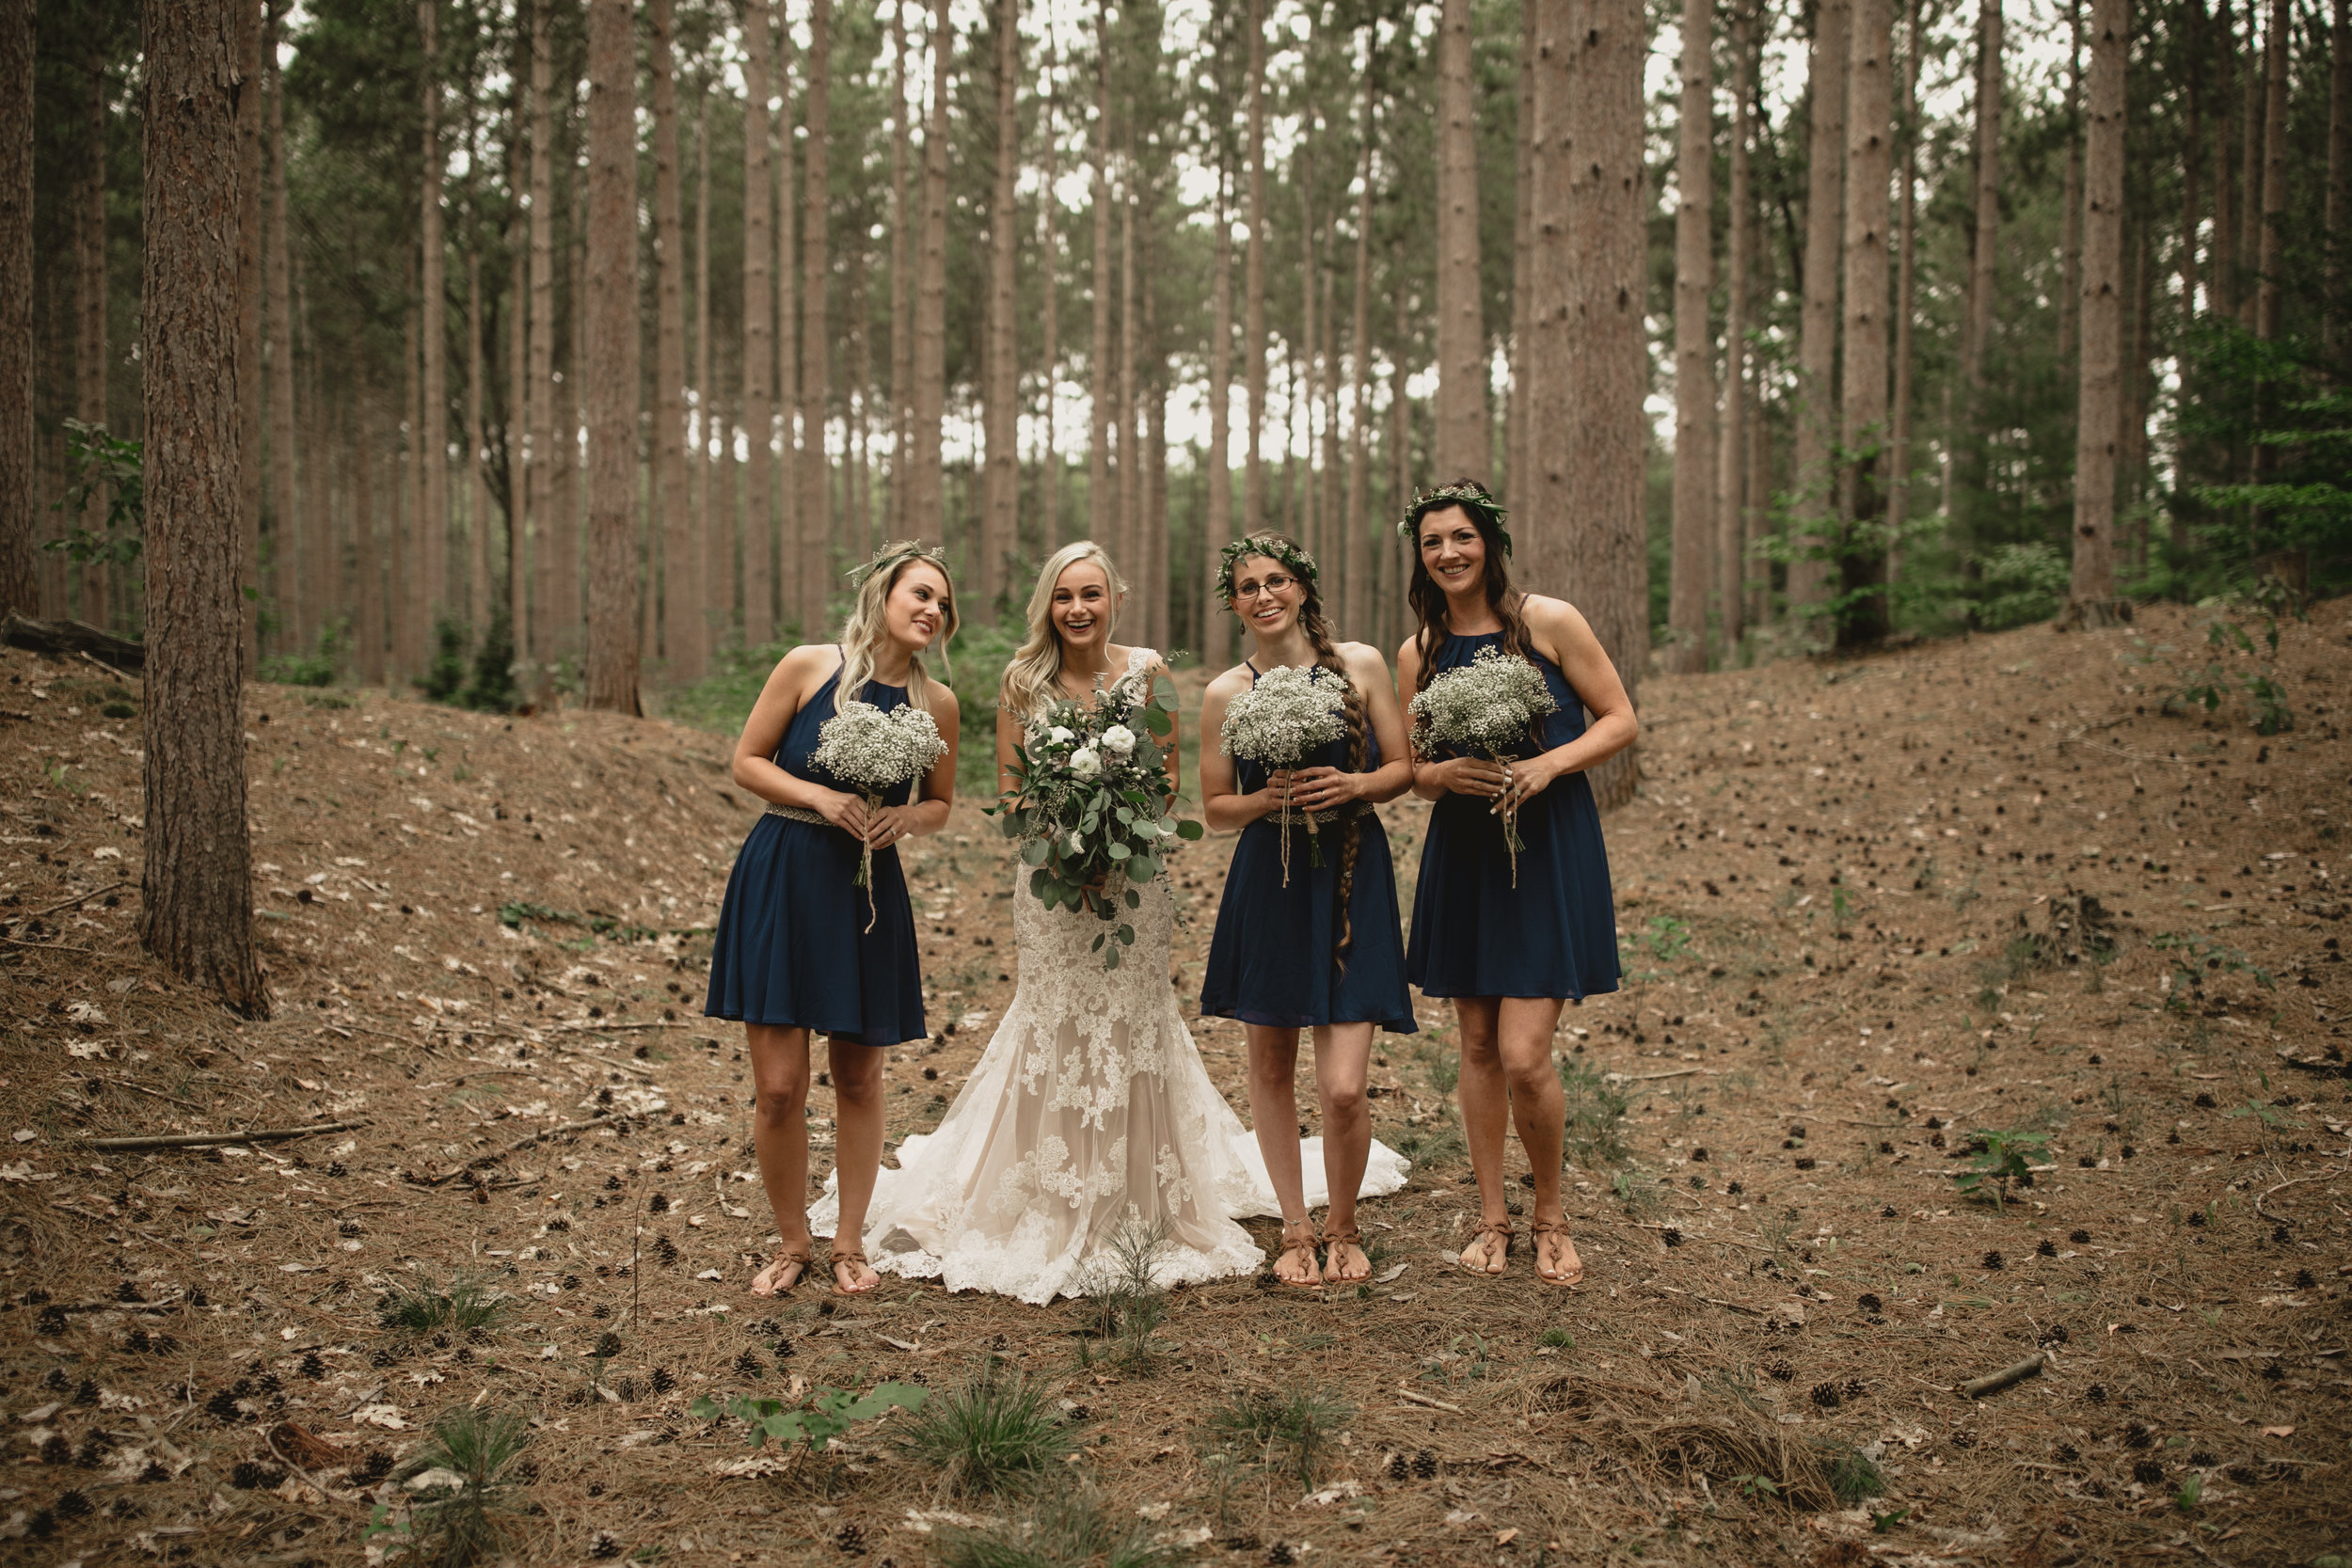 west-michigan-wedding-photographer-whitehall-rachel-austin-chapel-in-the-pines-444.jpg